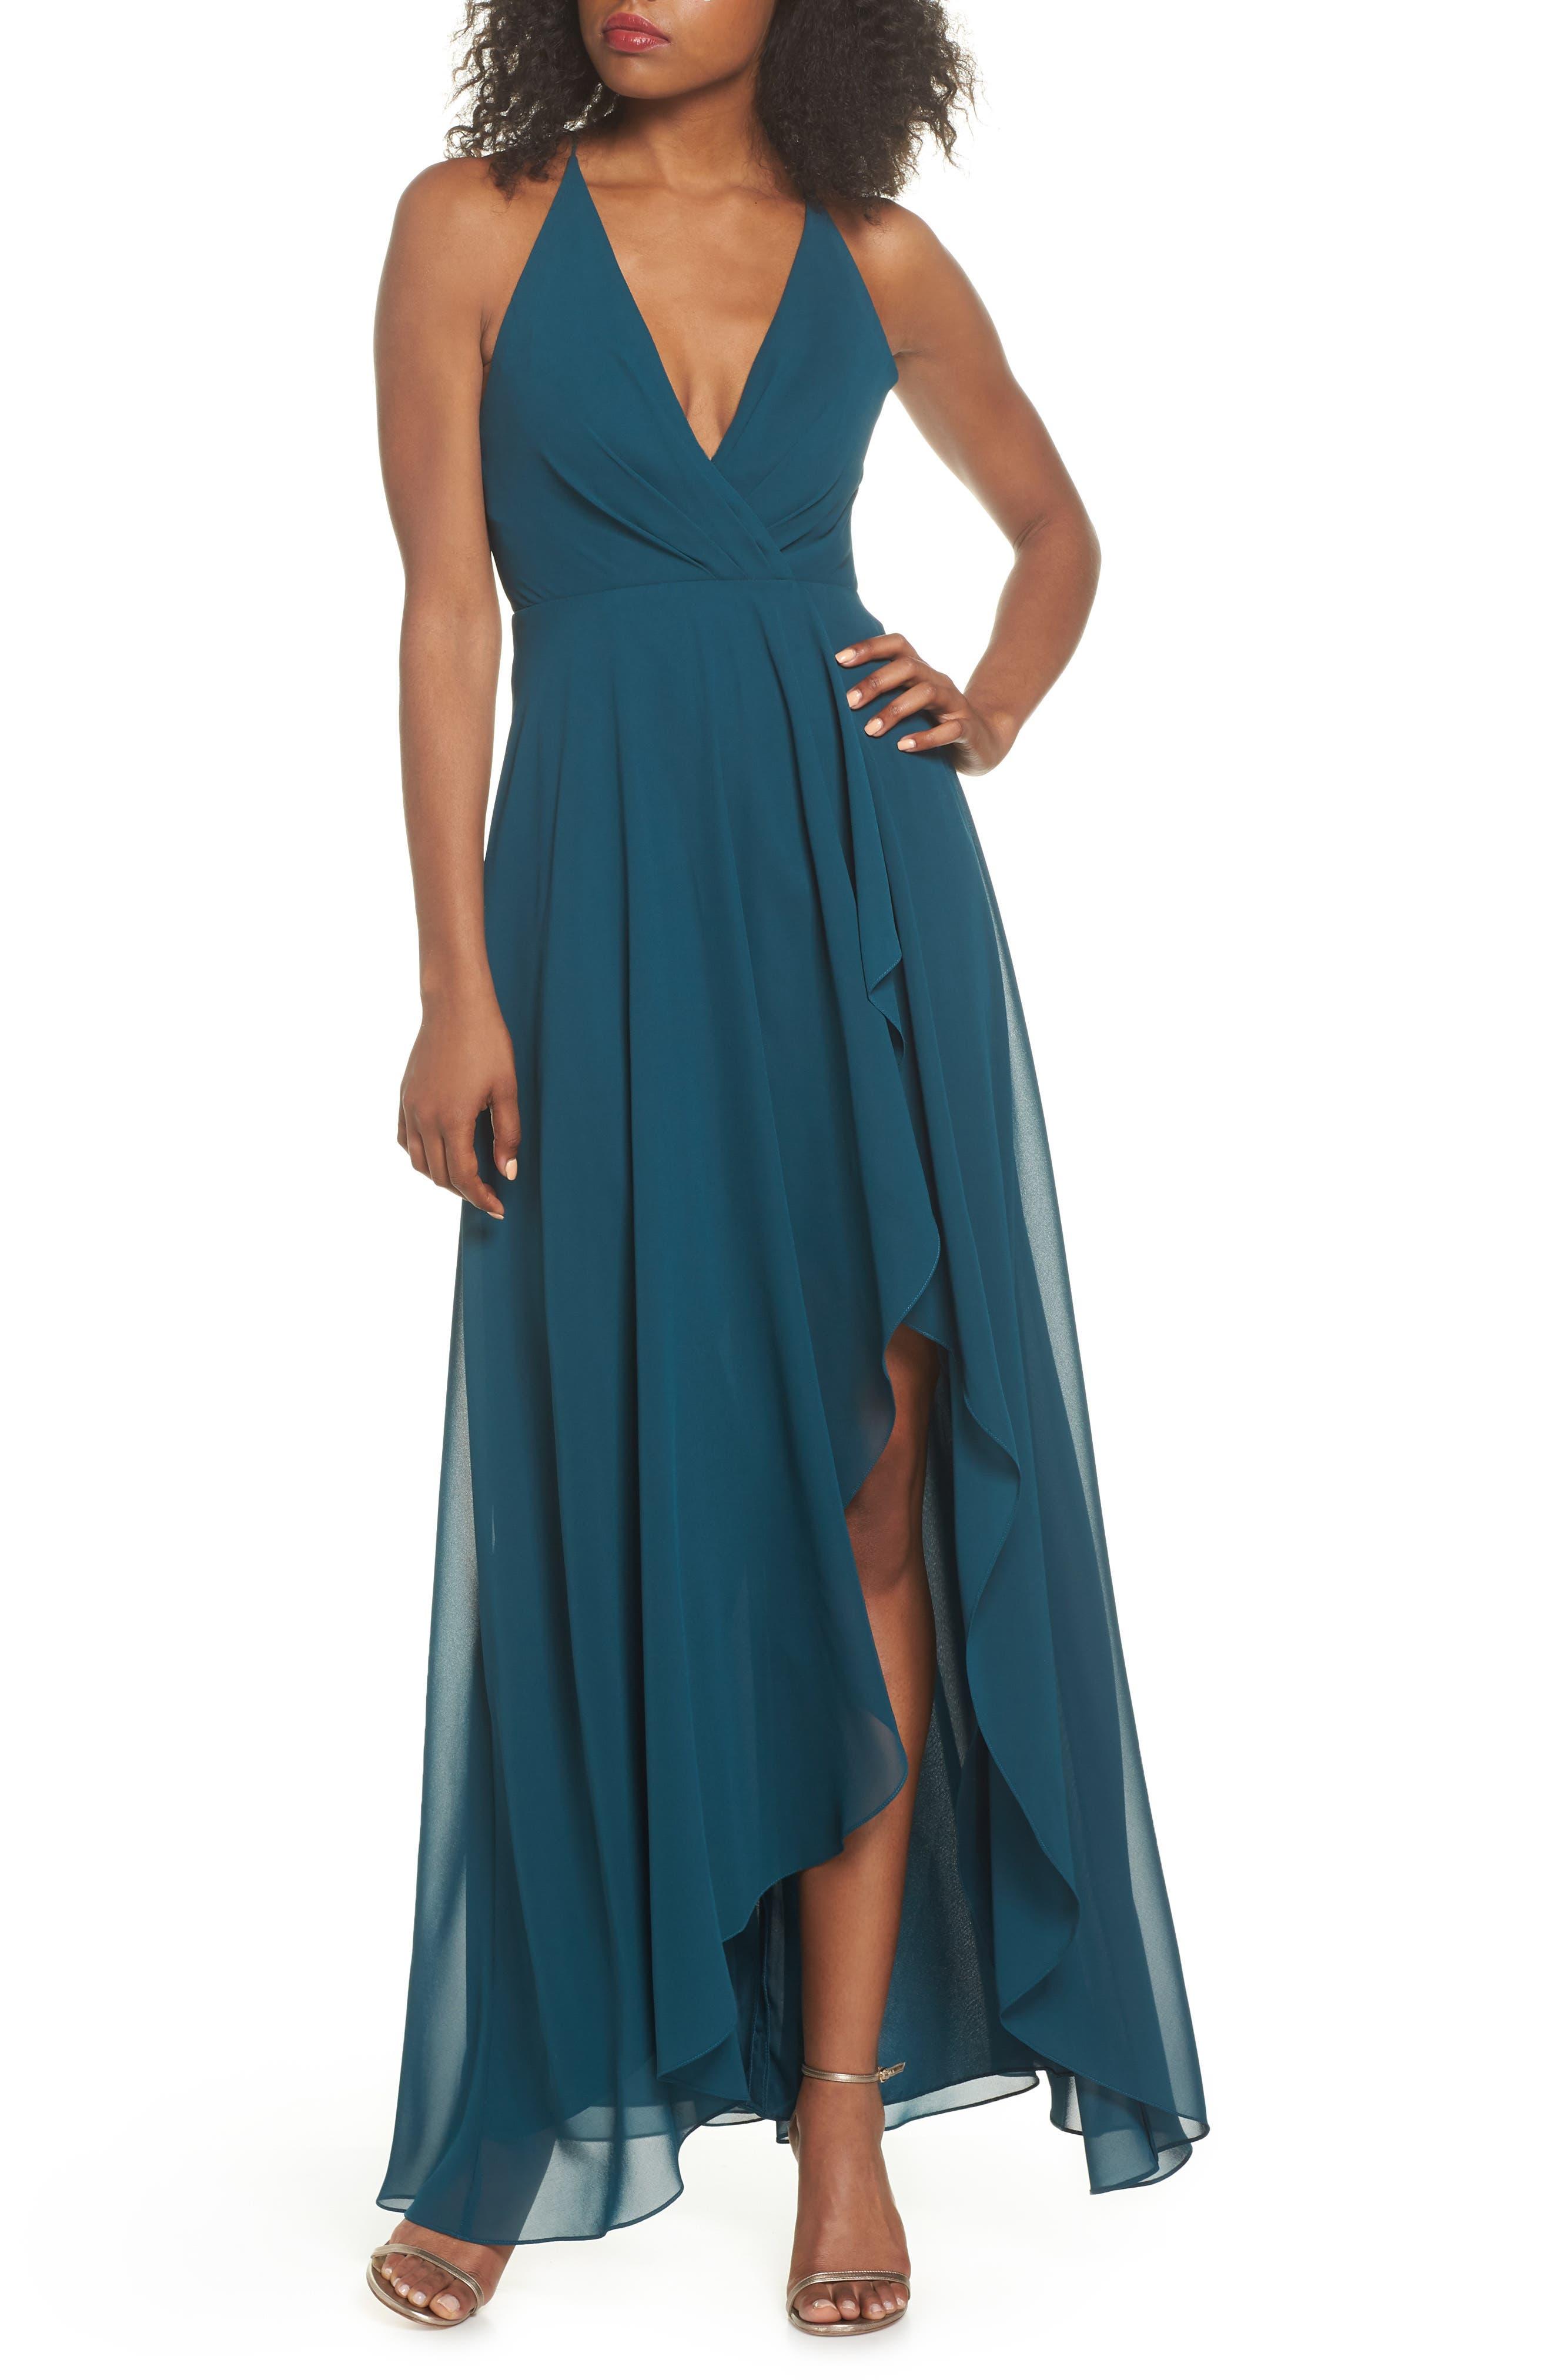 Alternate Image 1 Selected - Jenny Yoo Farrah Ruffle Skirt Chiffon Gown